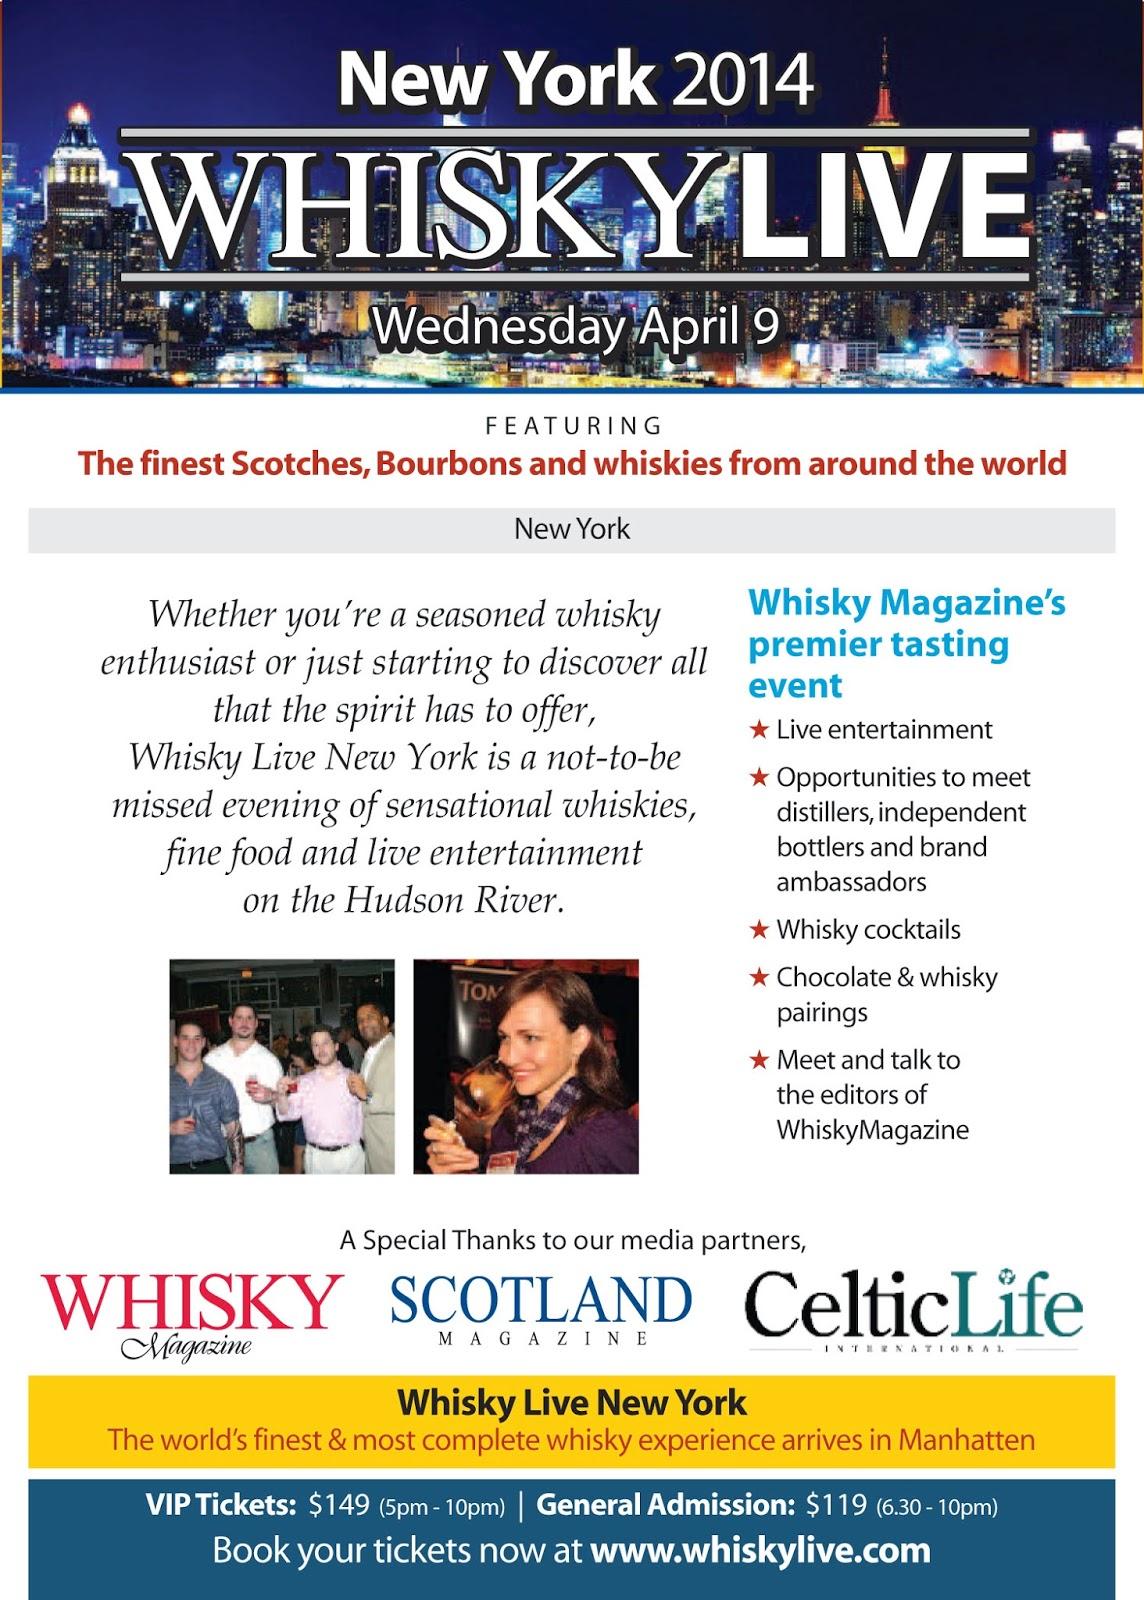 http://www.whiskylive.com/usa/98/new-york-2014